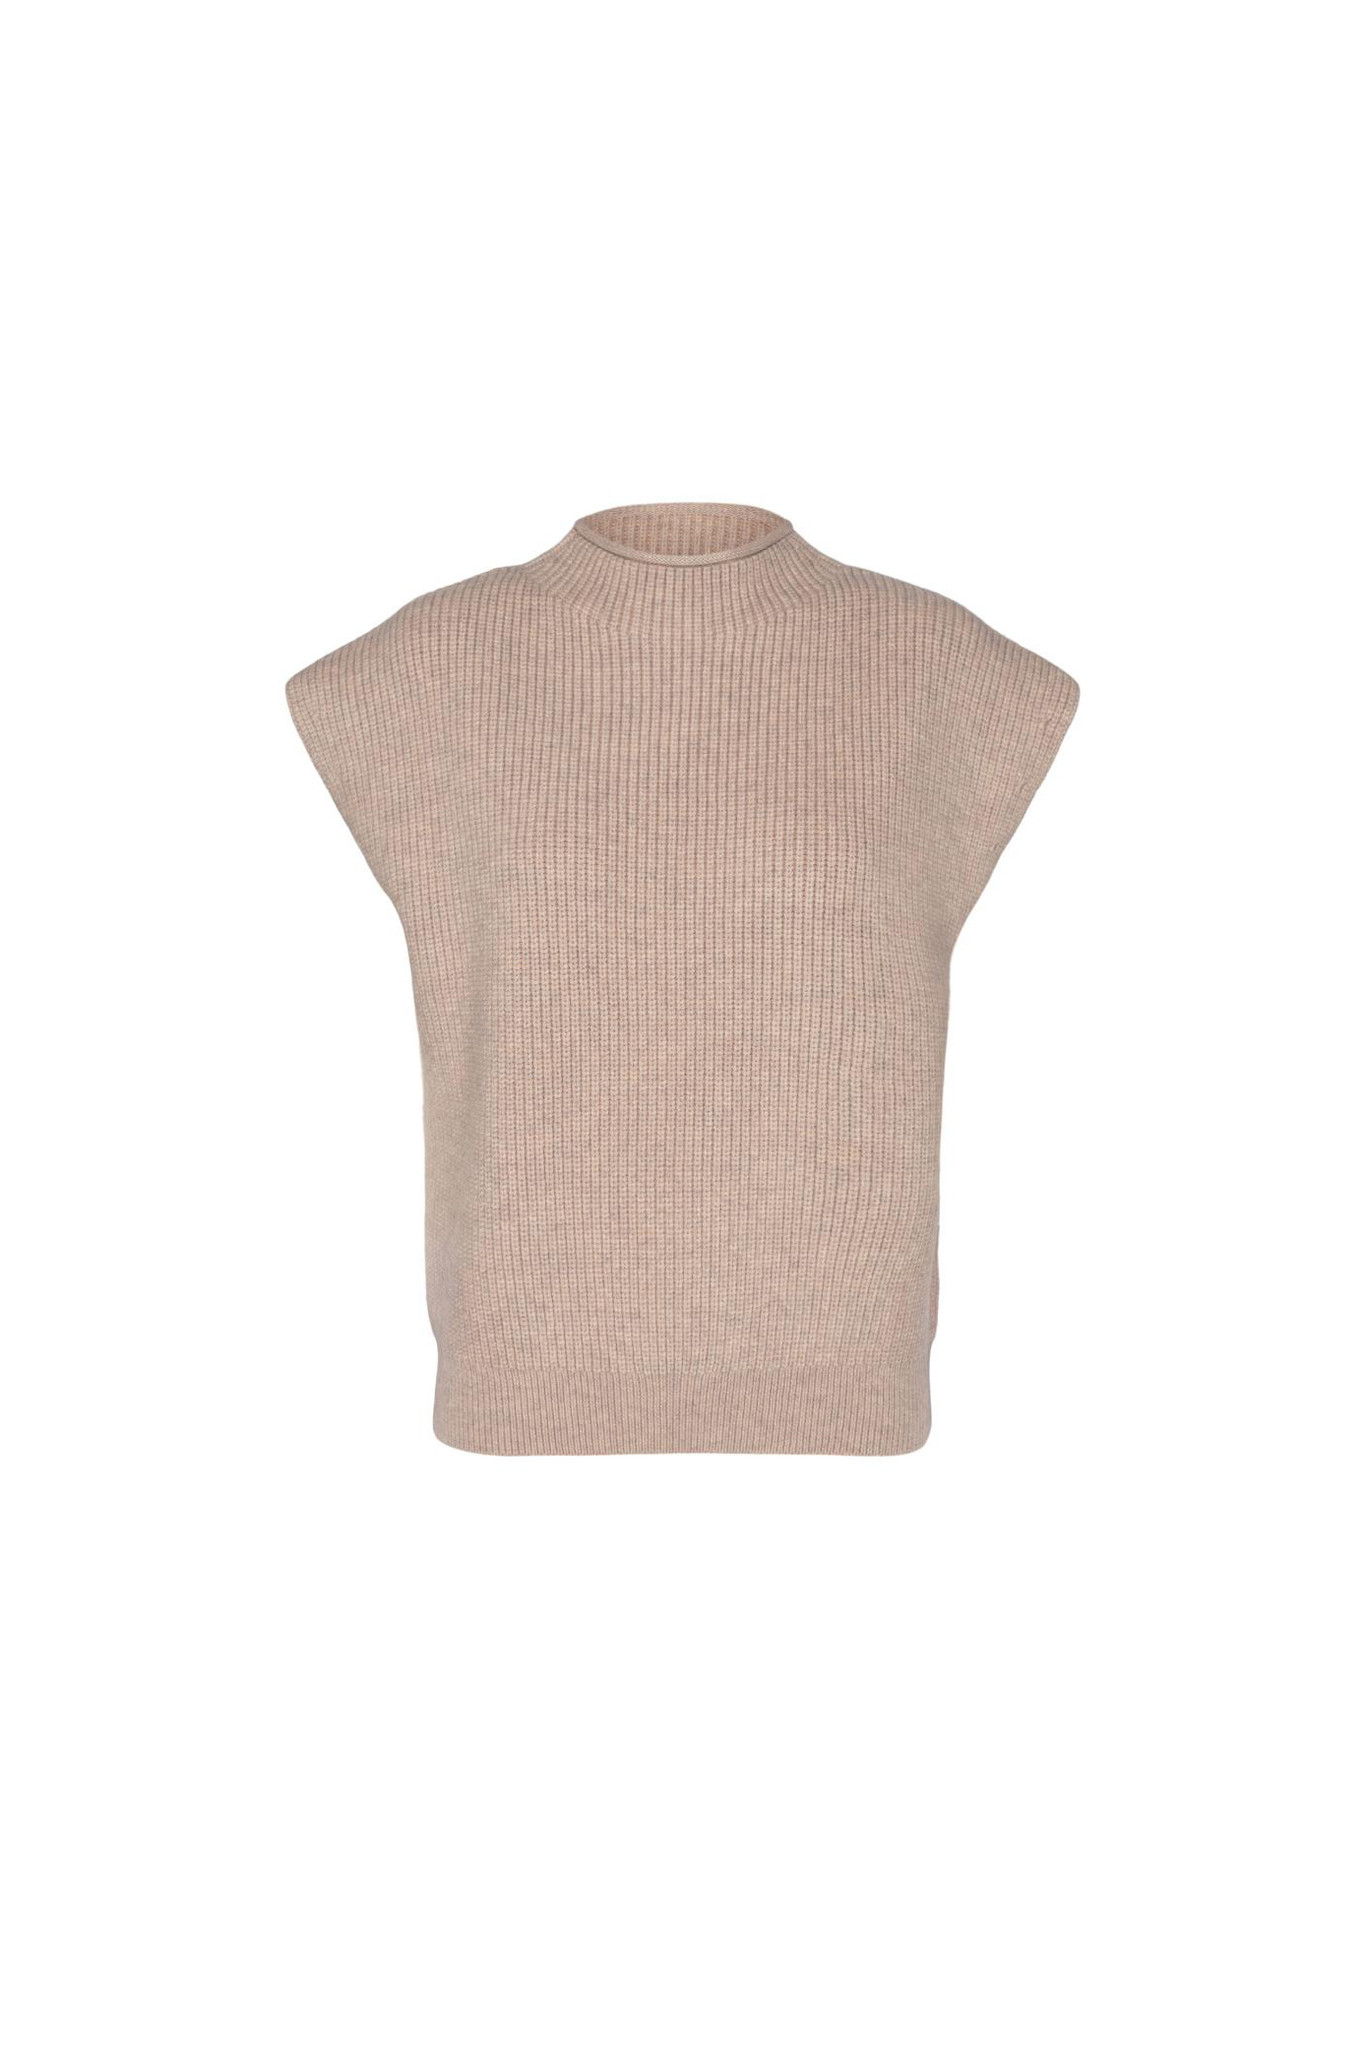 Row Wing Knit Top - Bone-1